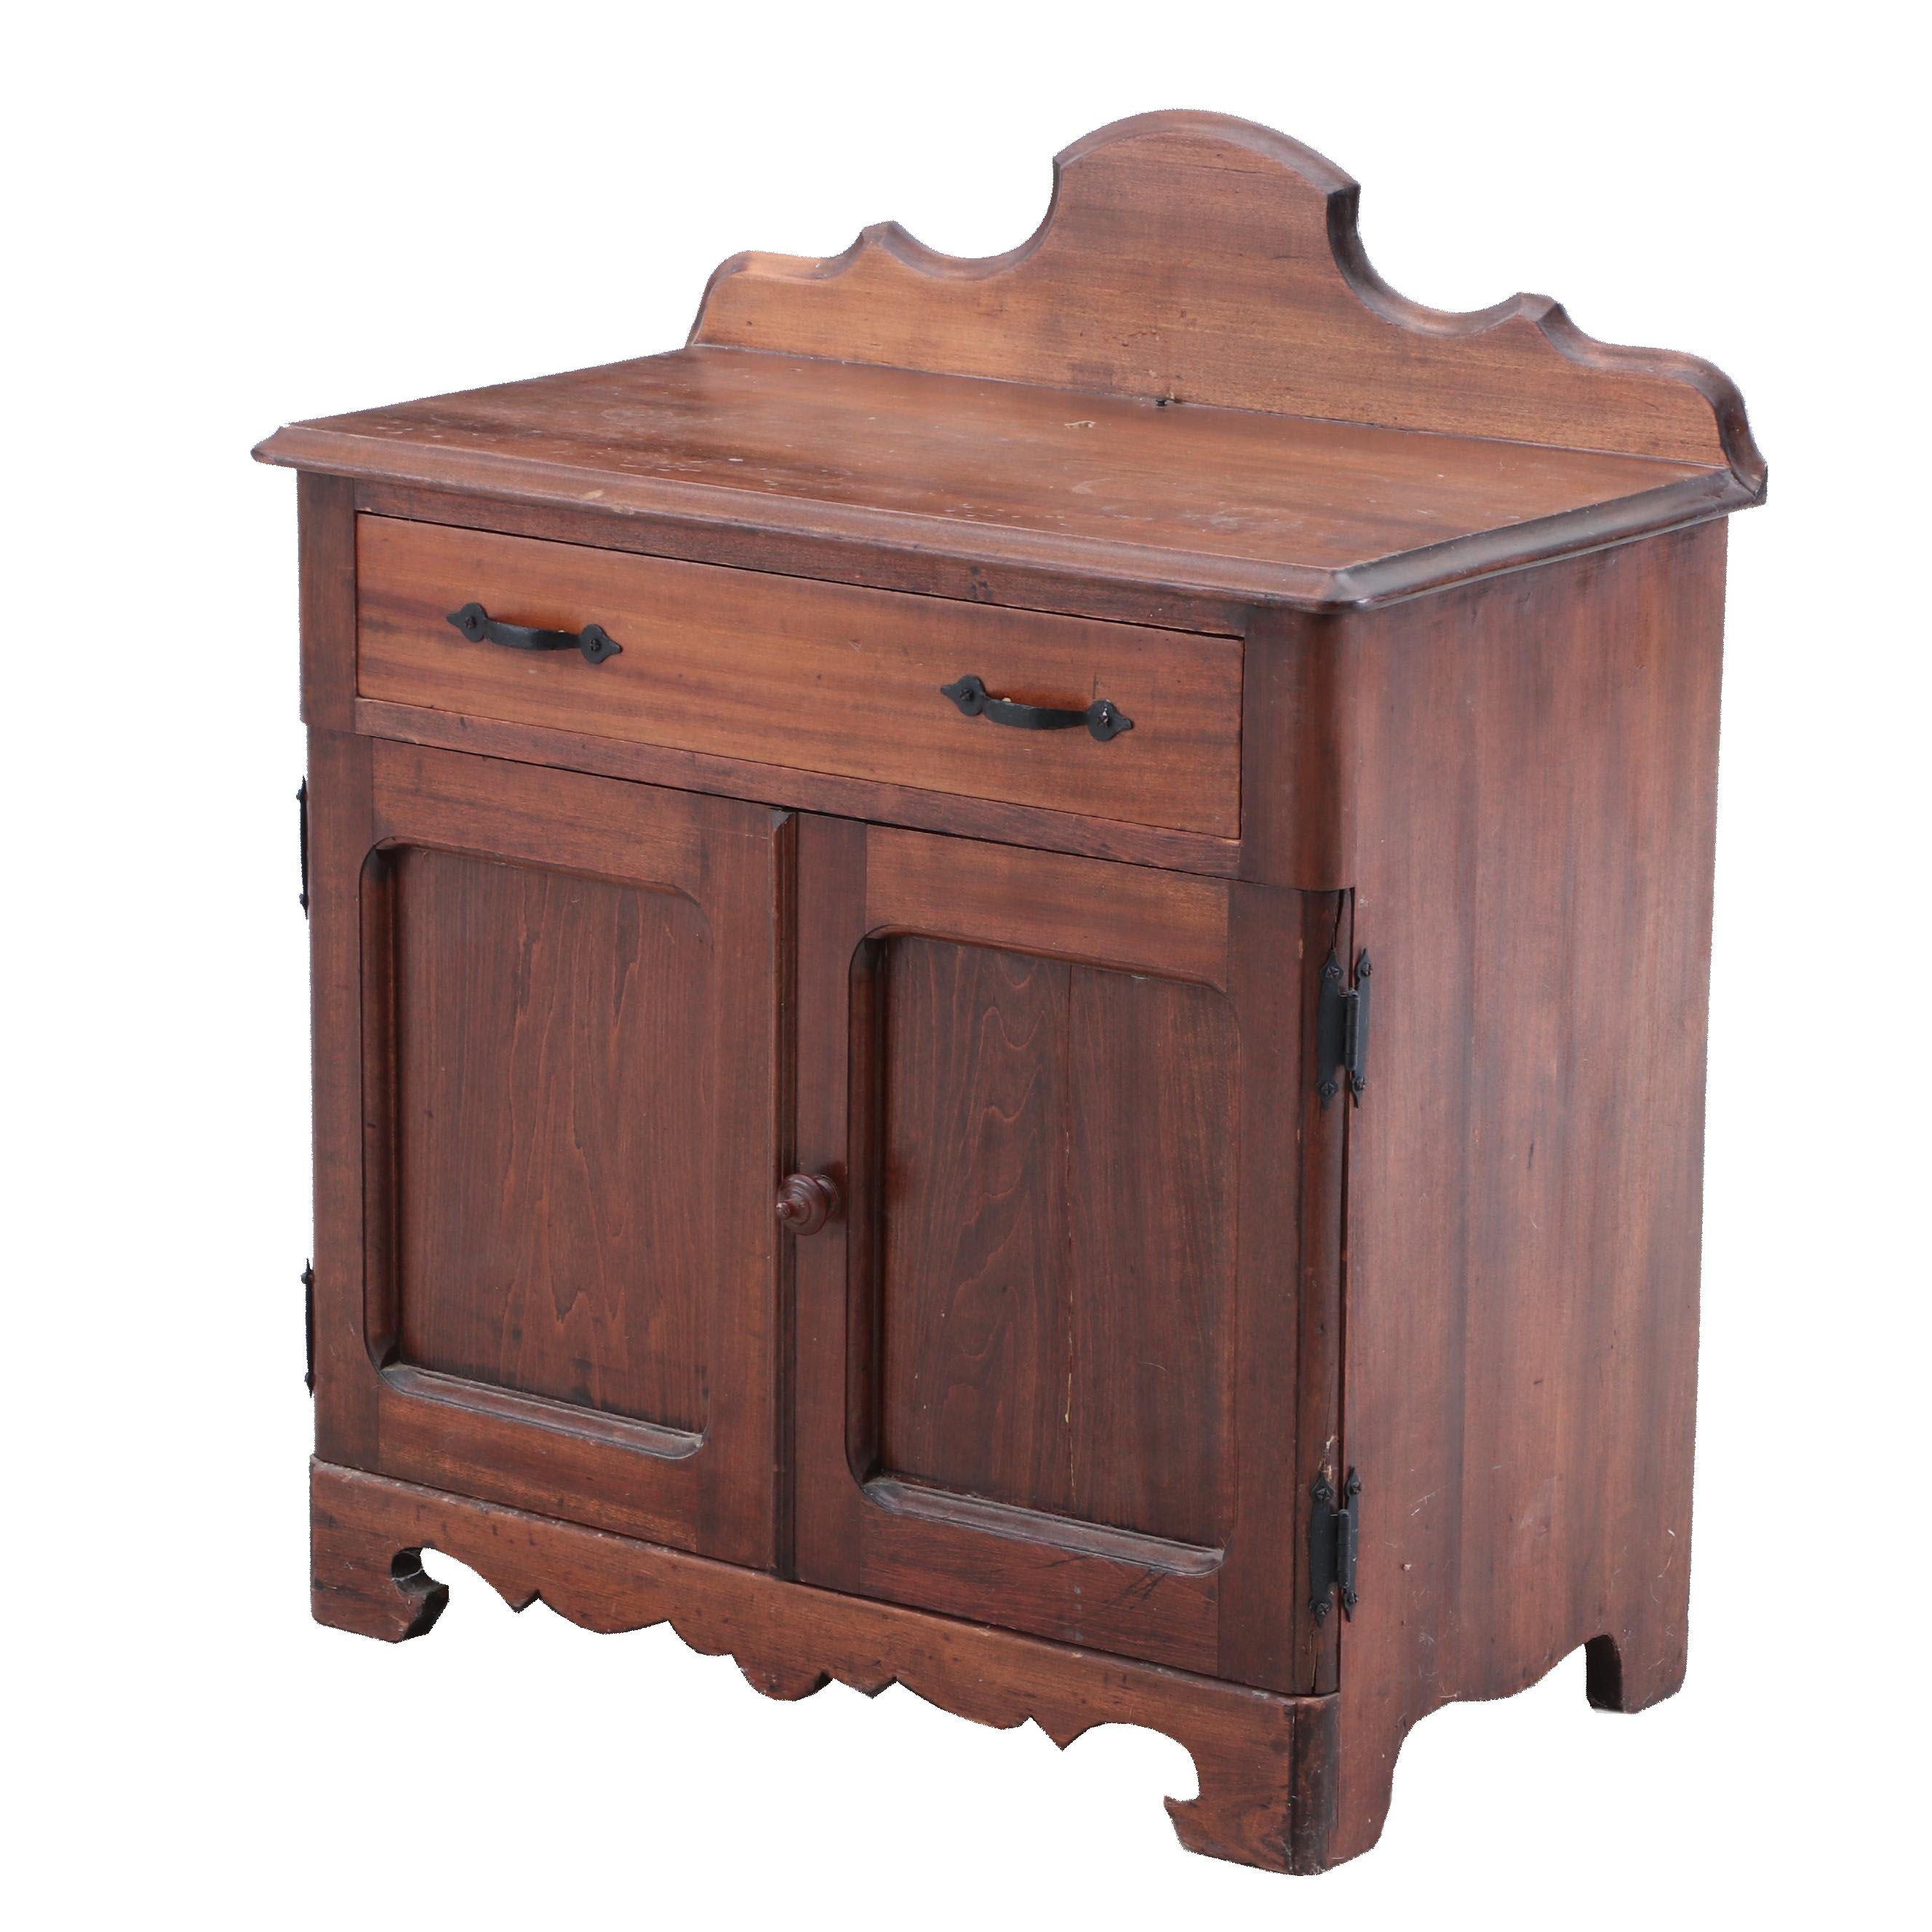 Wash Stand Cabinet in Walnut